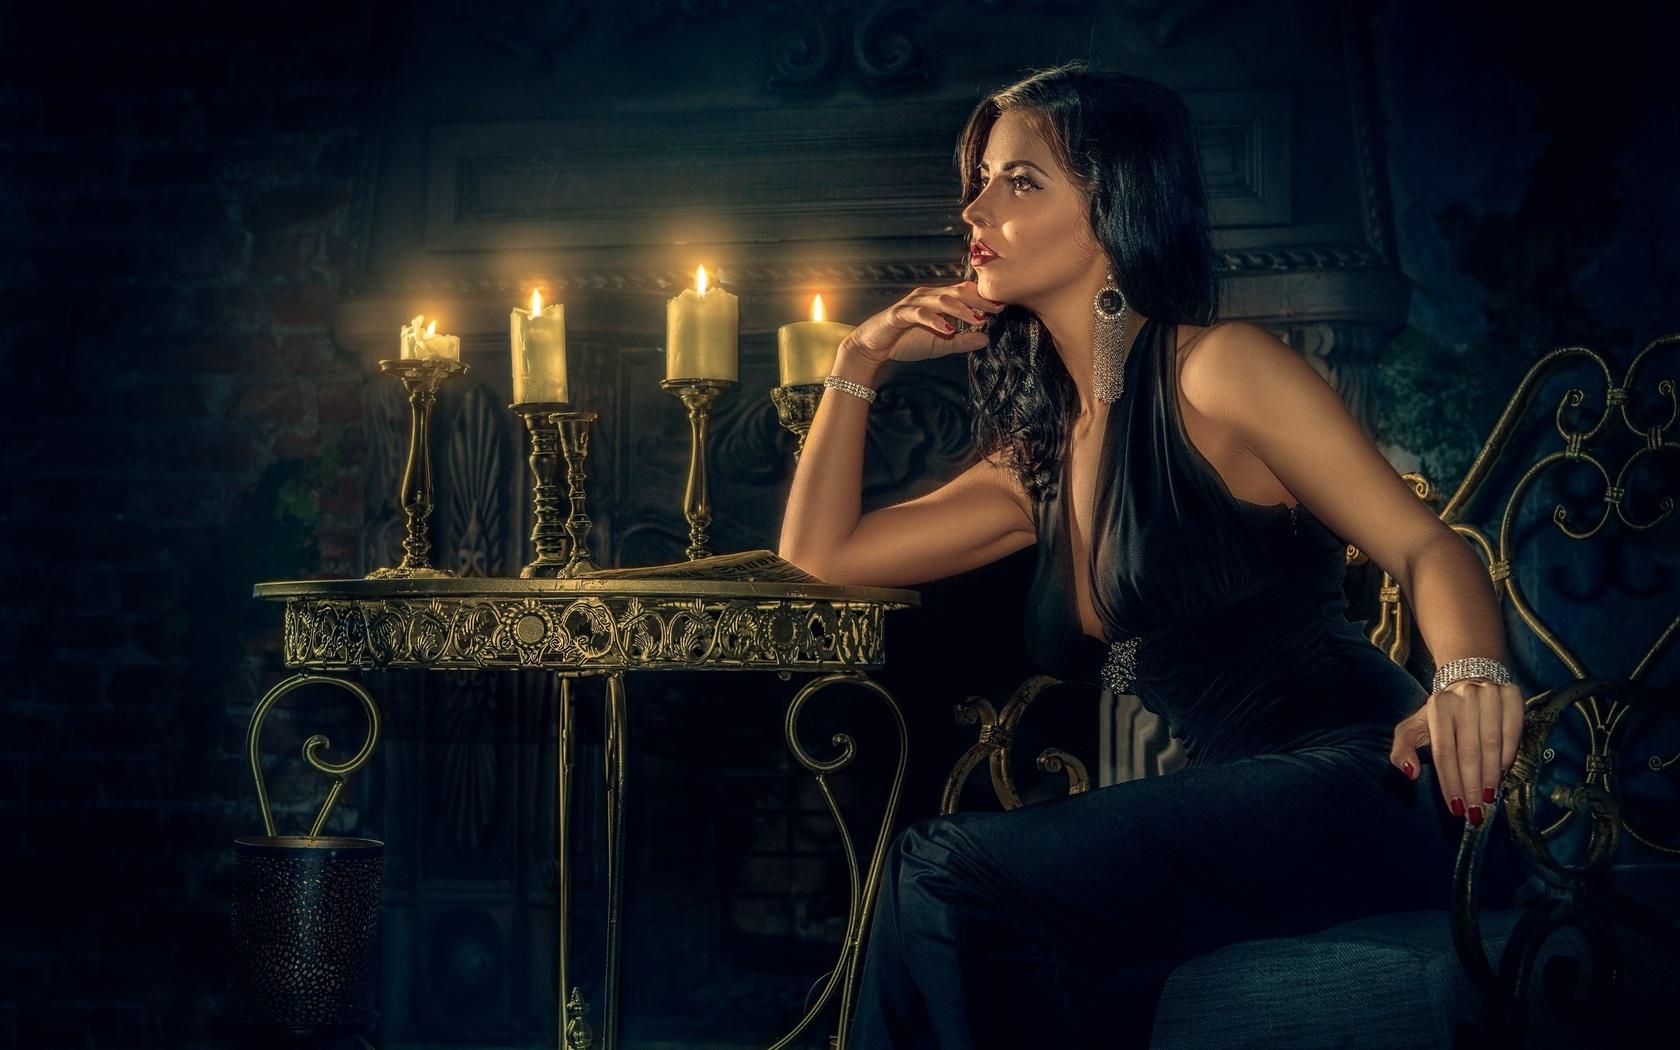 fireplace, decoration, manicure, girl, candles, makeup